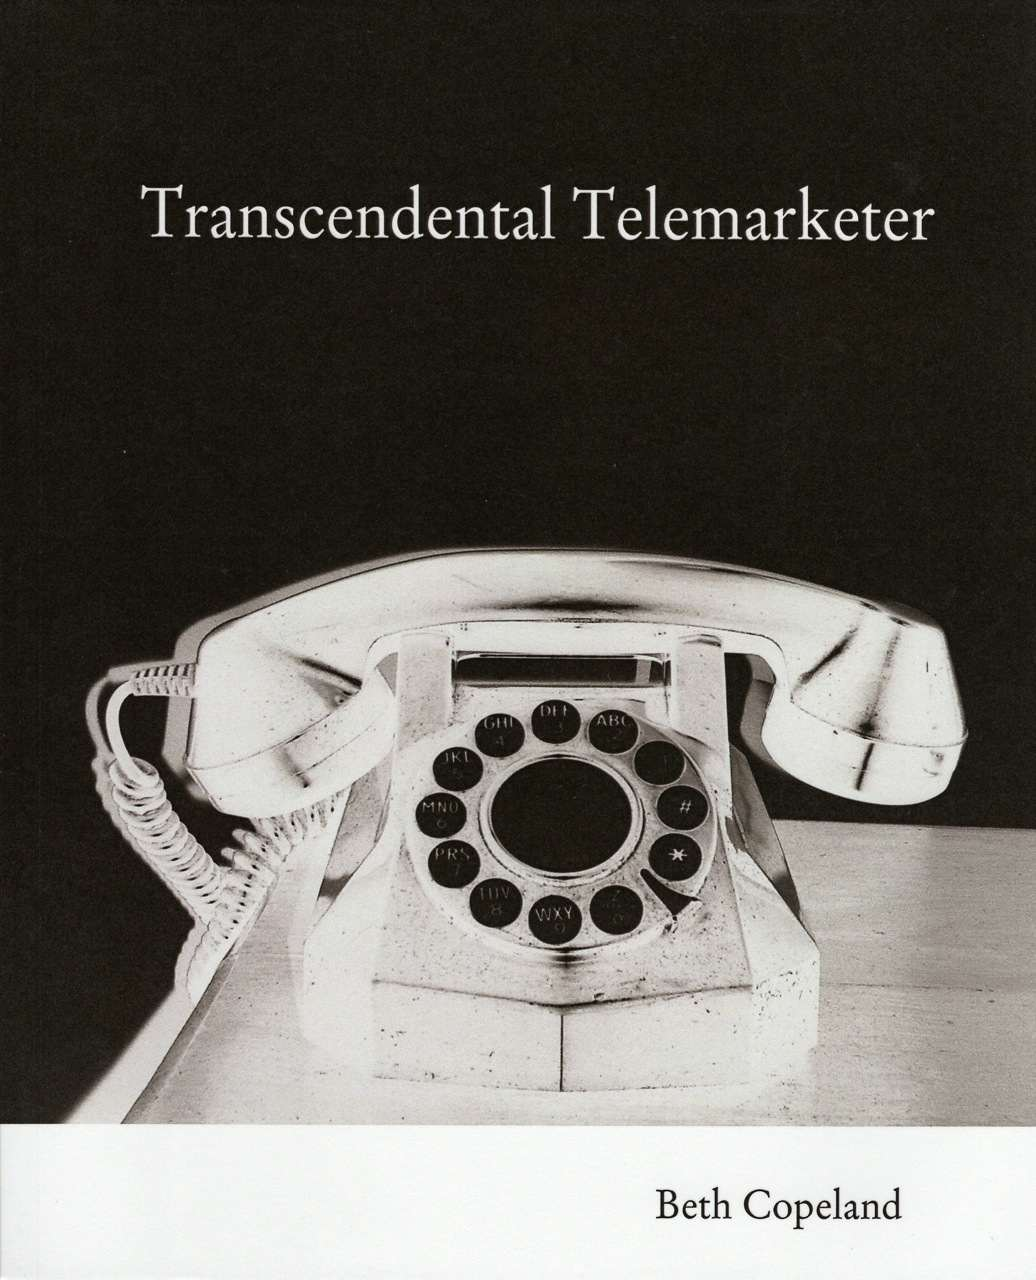 Beth Copeland-Transcendental Telemarketer